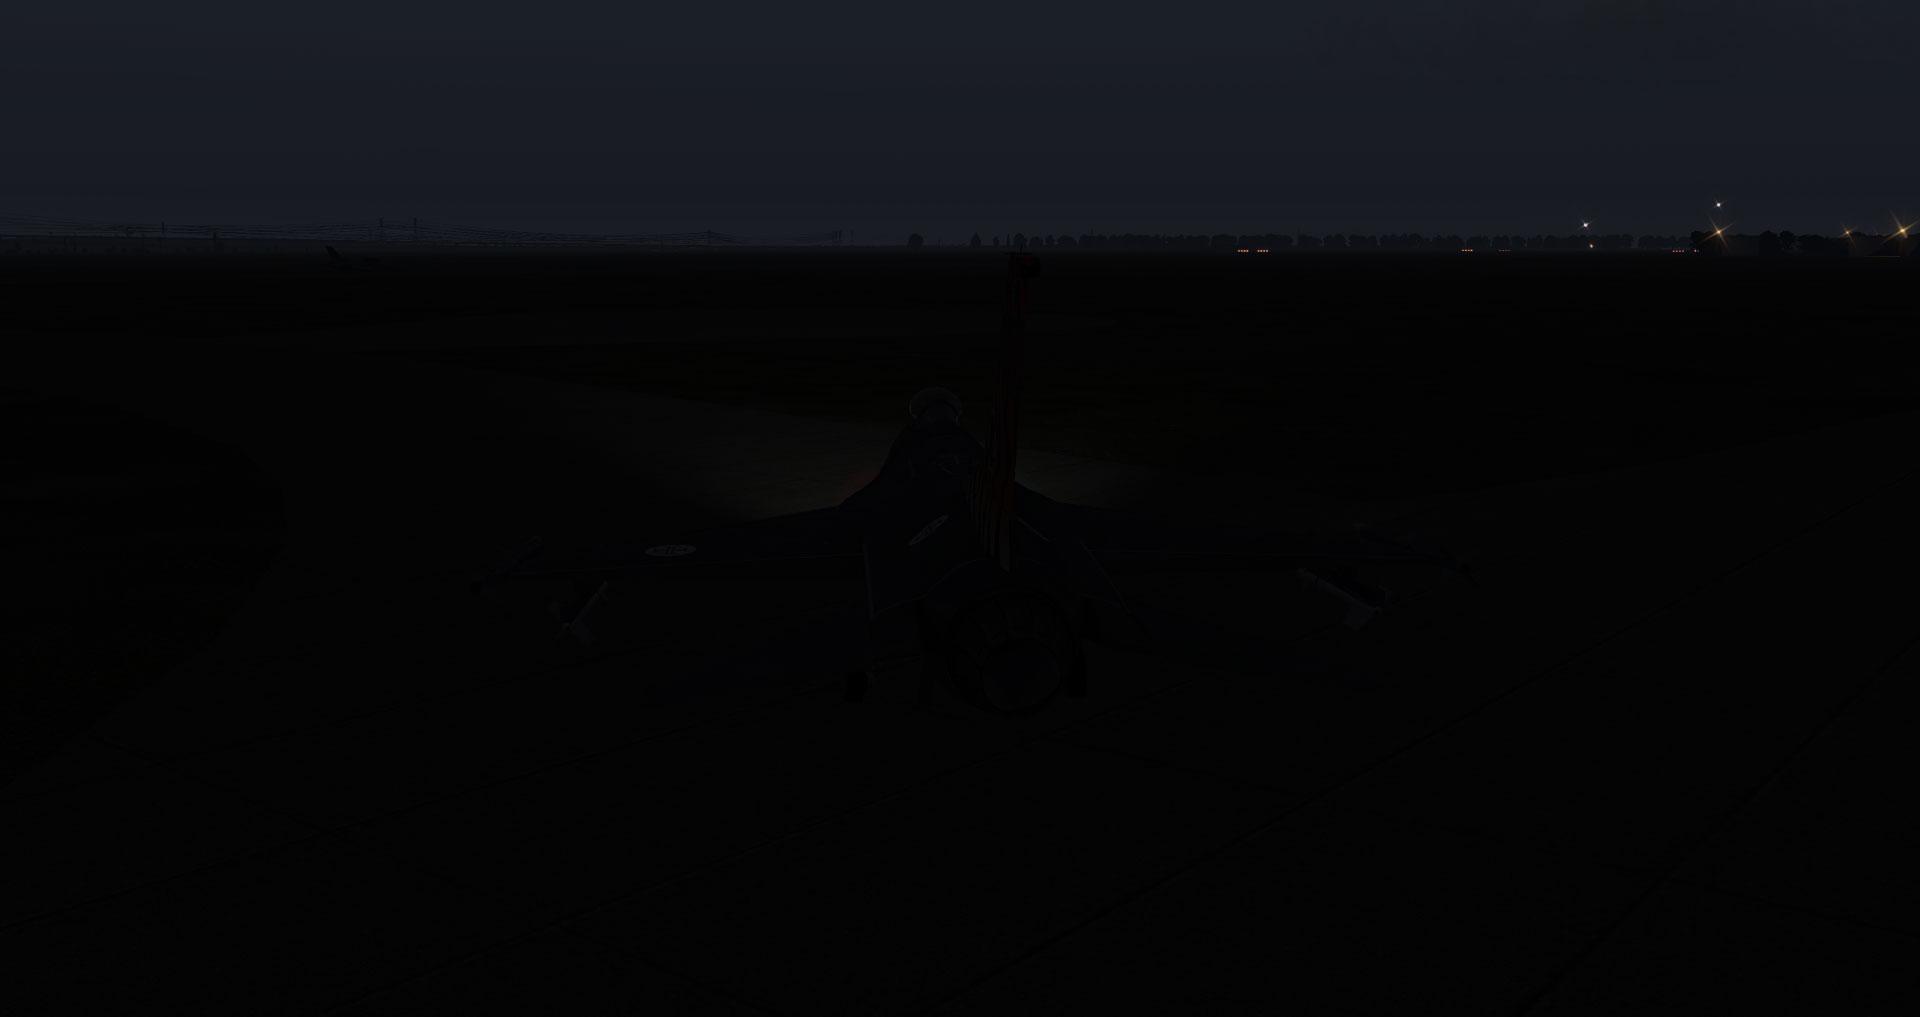 F_16---2021-03-21-17.12